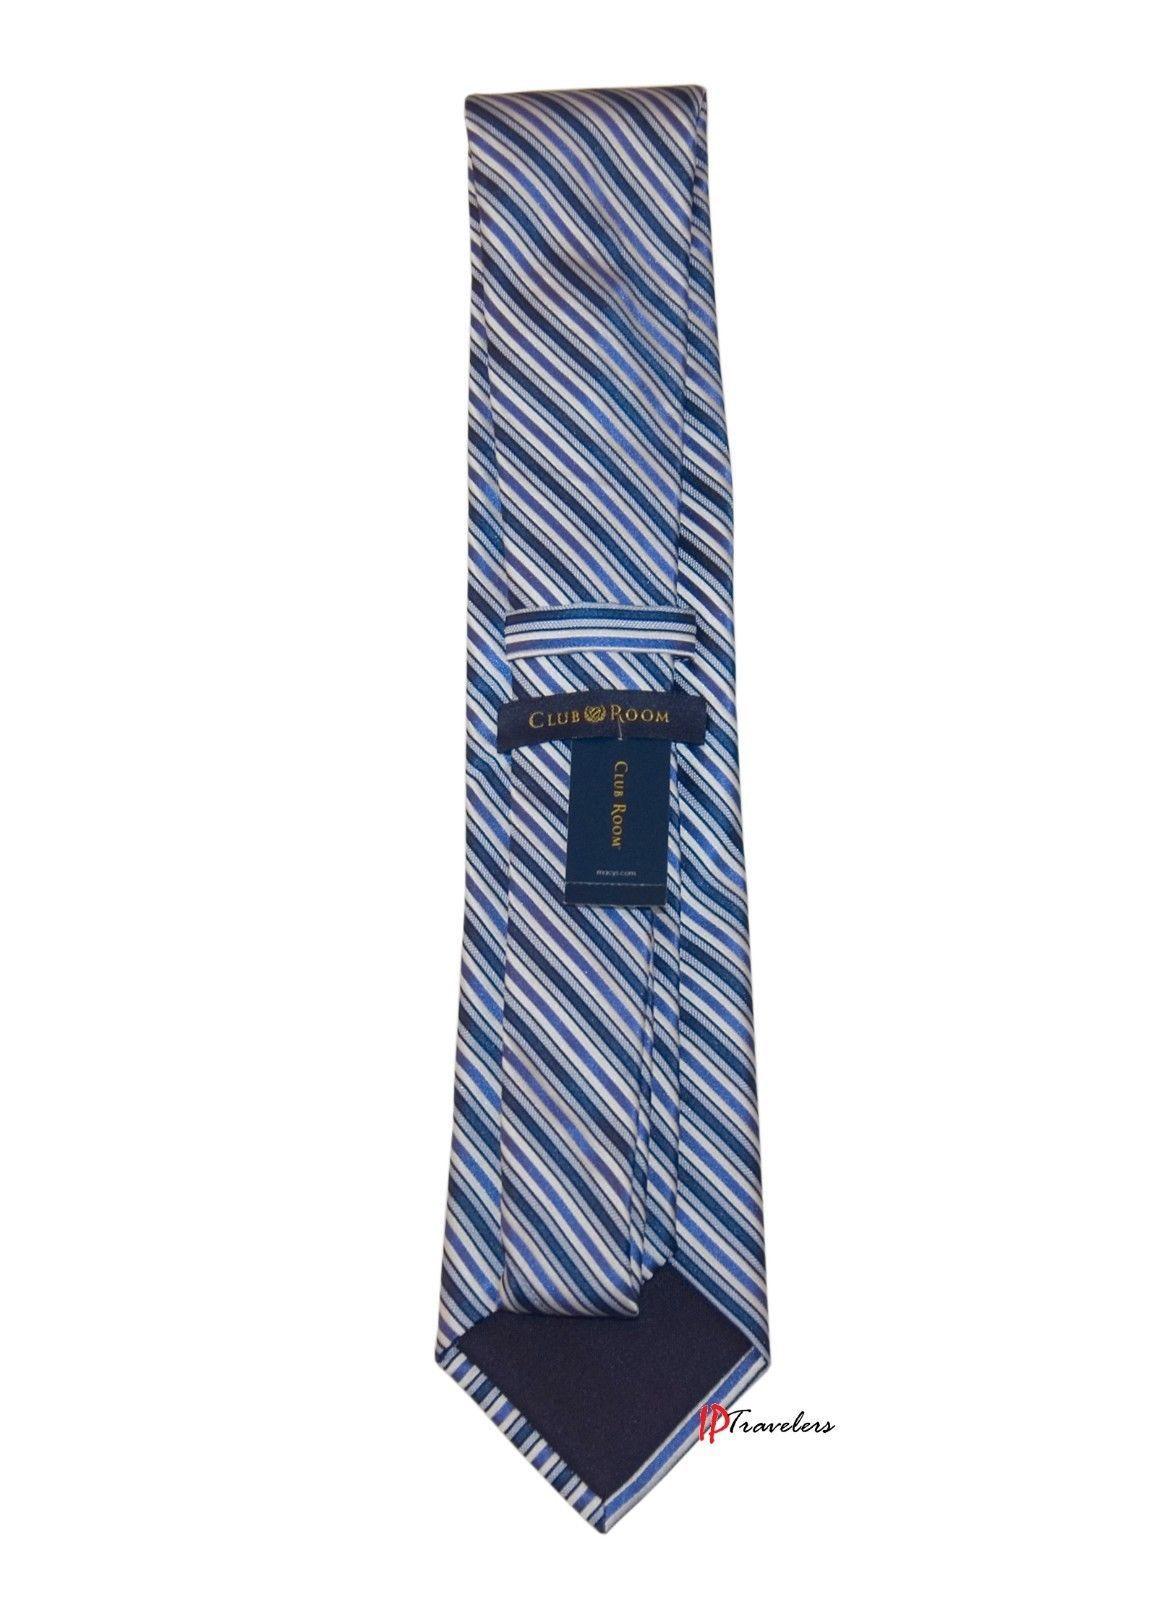 Club Room Men's Neck Tie Medium Blue and White Stripes 100% Silk $49.50